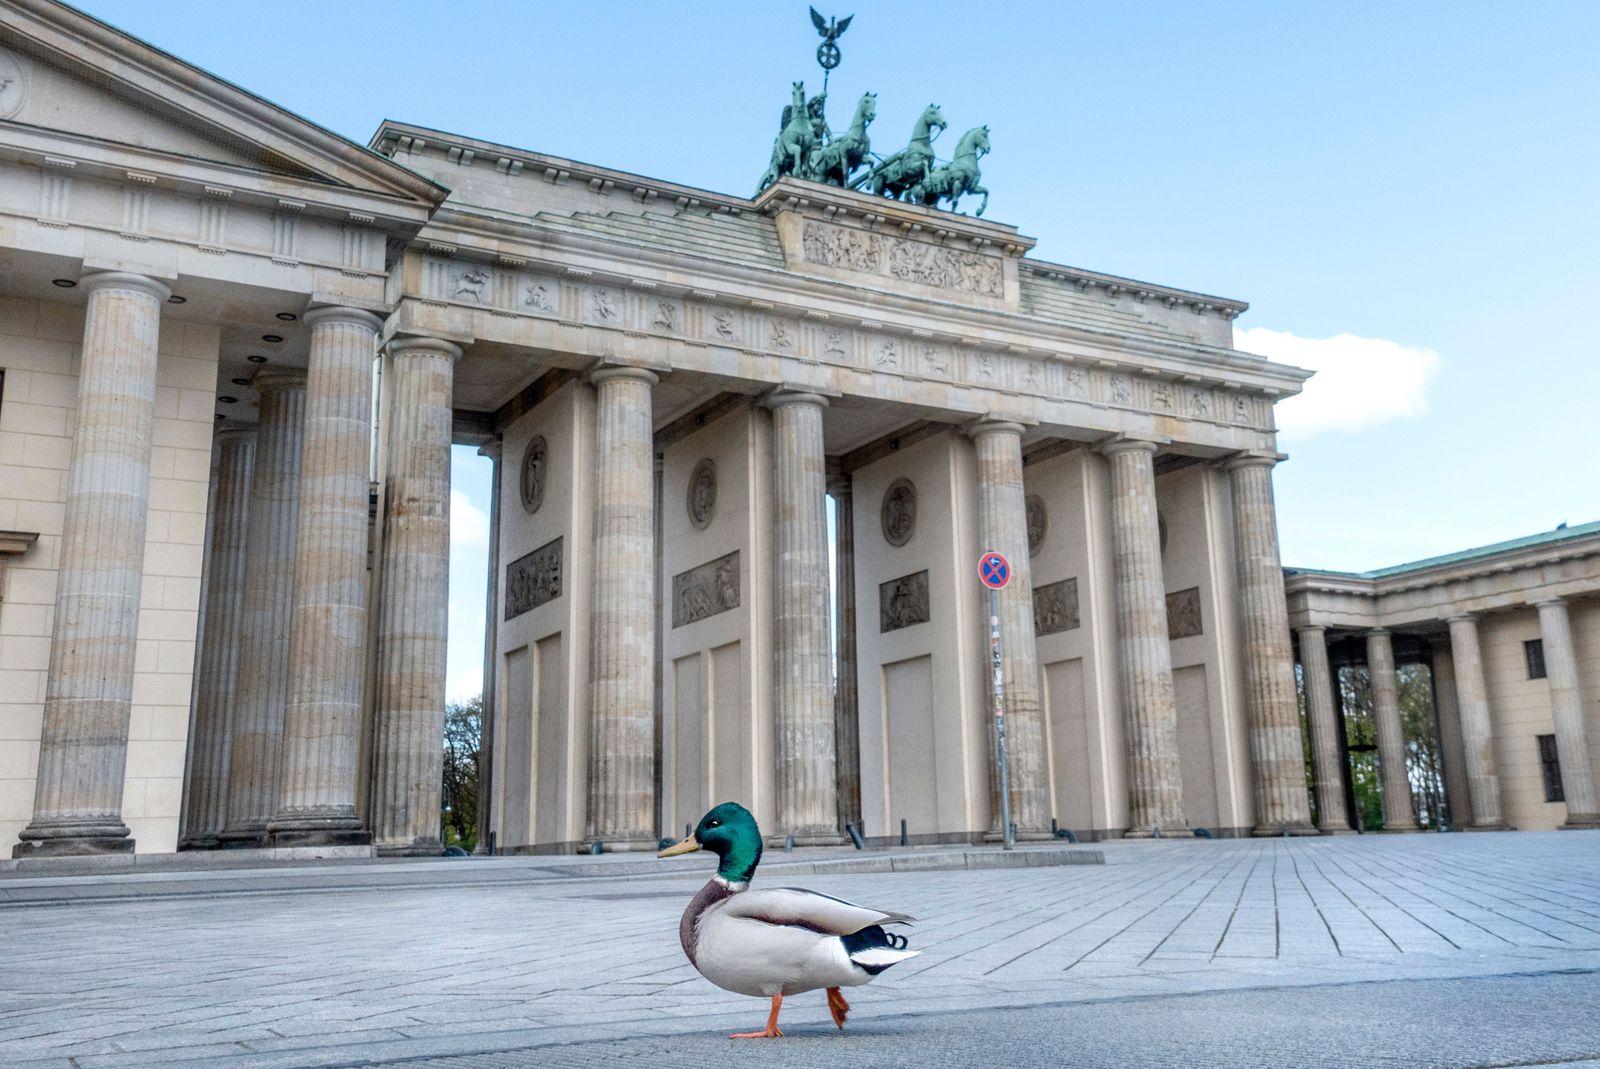 Ducks at Pariser Platz in Berlin, Germany - 14 Apr 2020